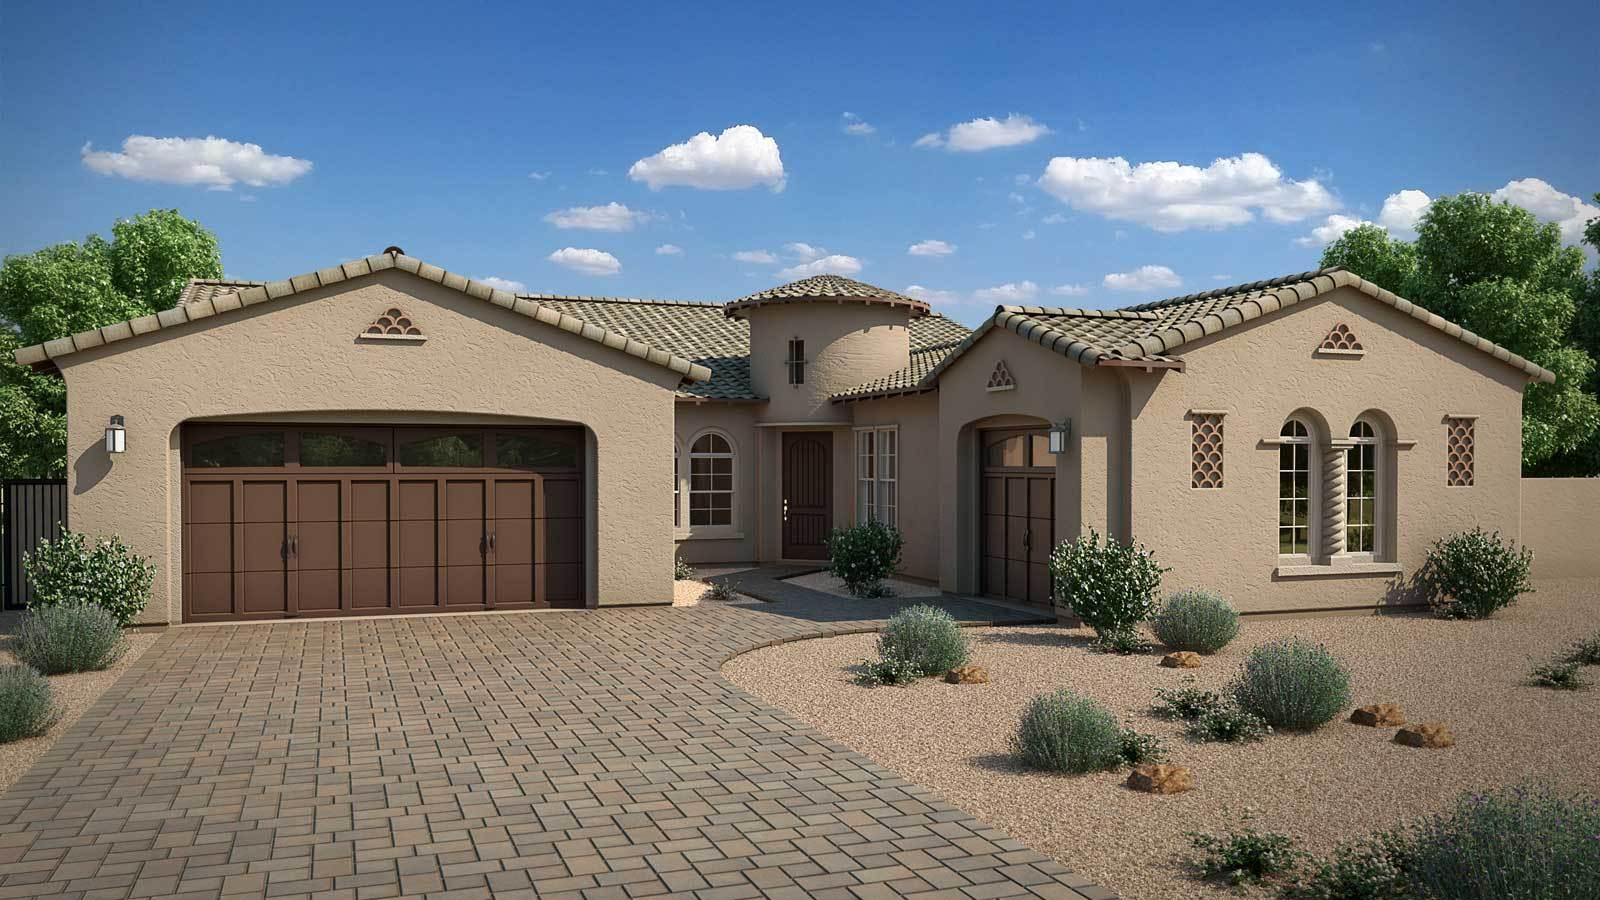 Single Family for Sale at Hawthorn Manor - Quartz 2361 E. Cherrywood Place Chandler, Arizona 85249 United States